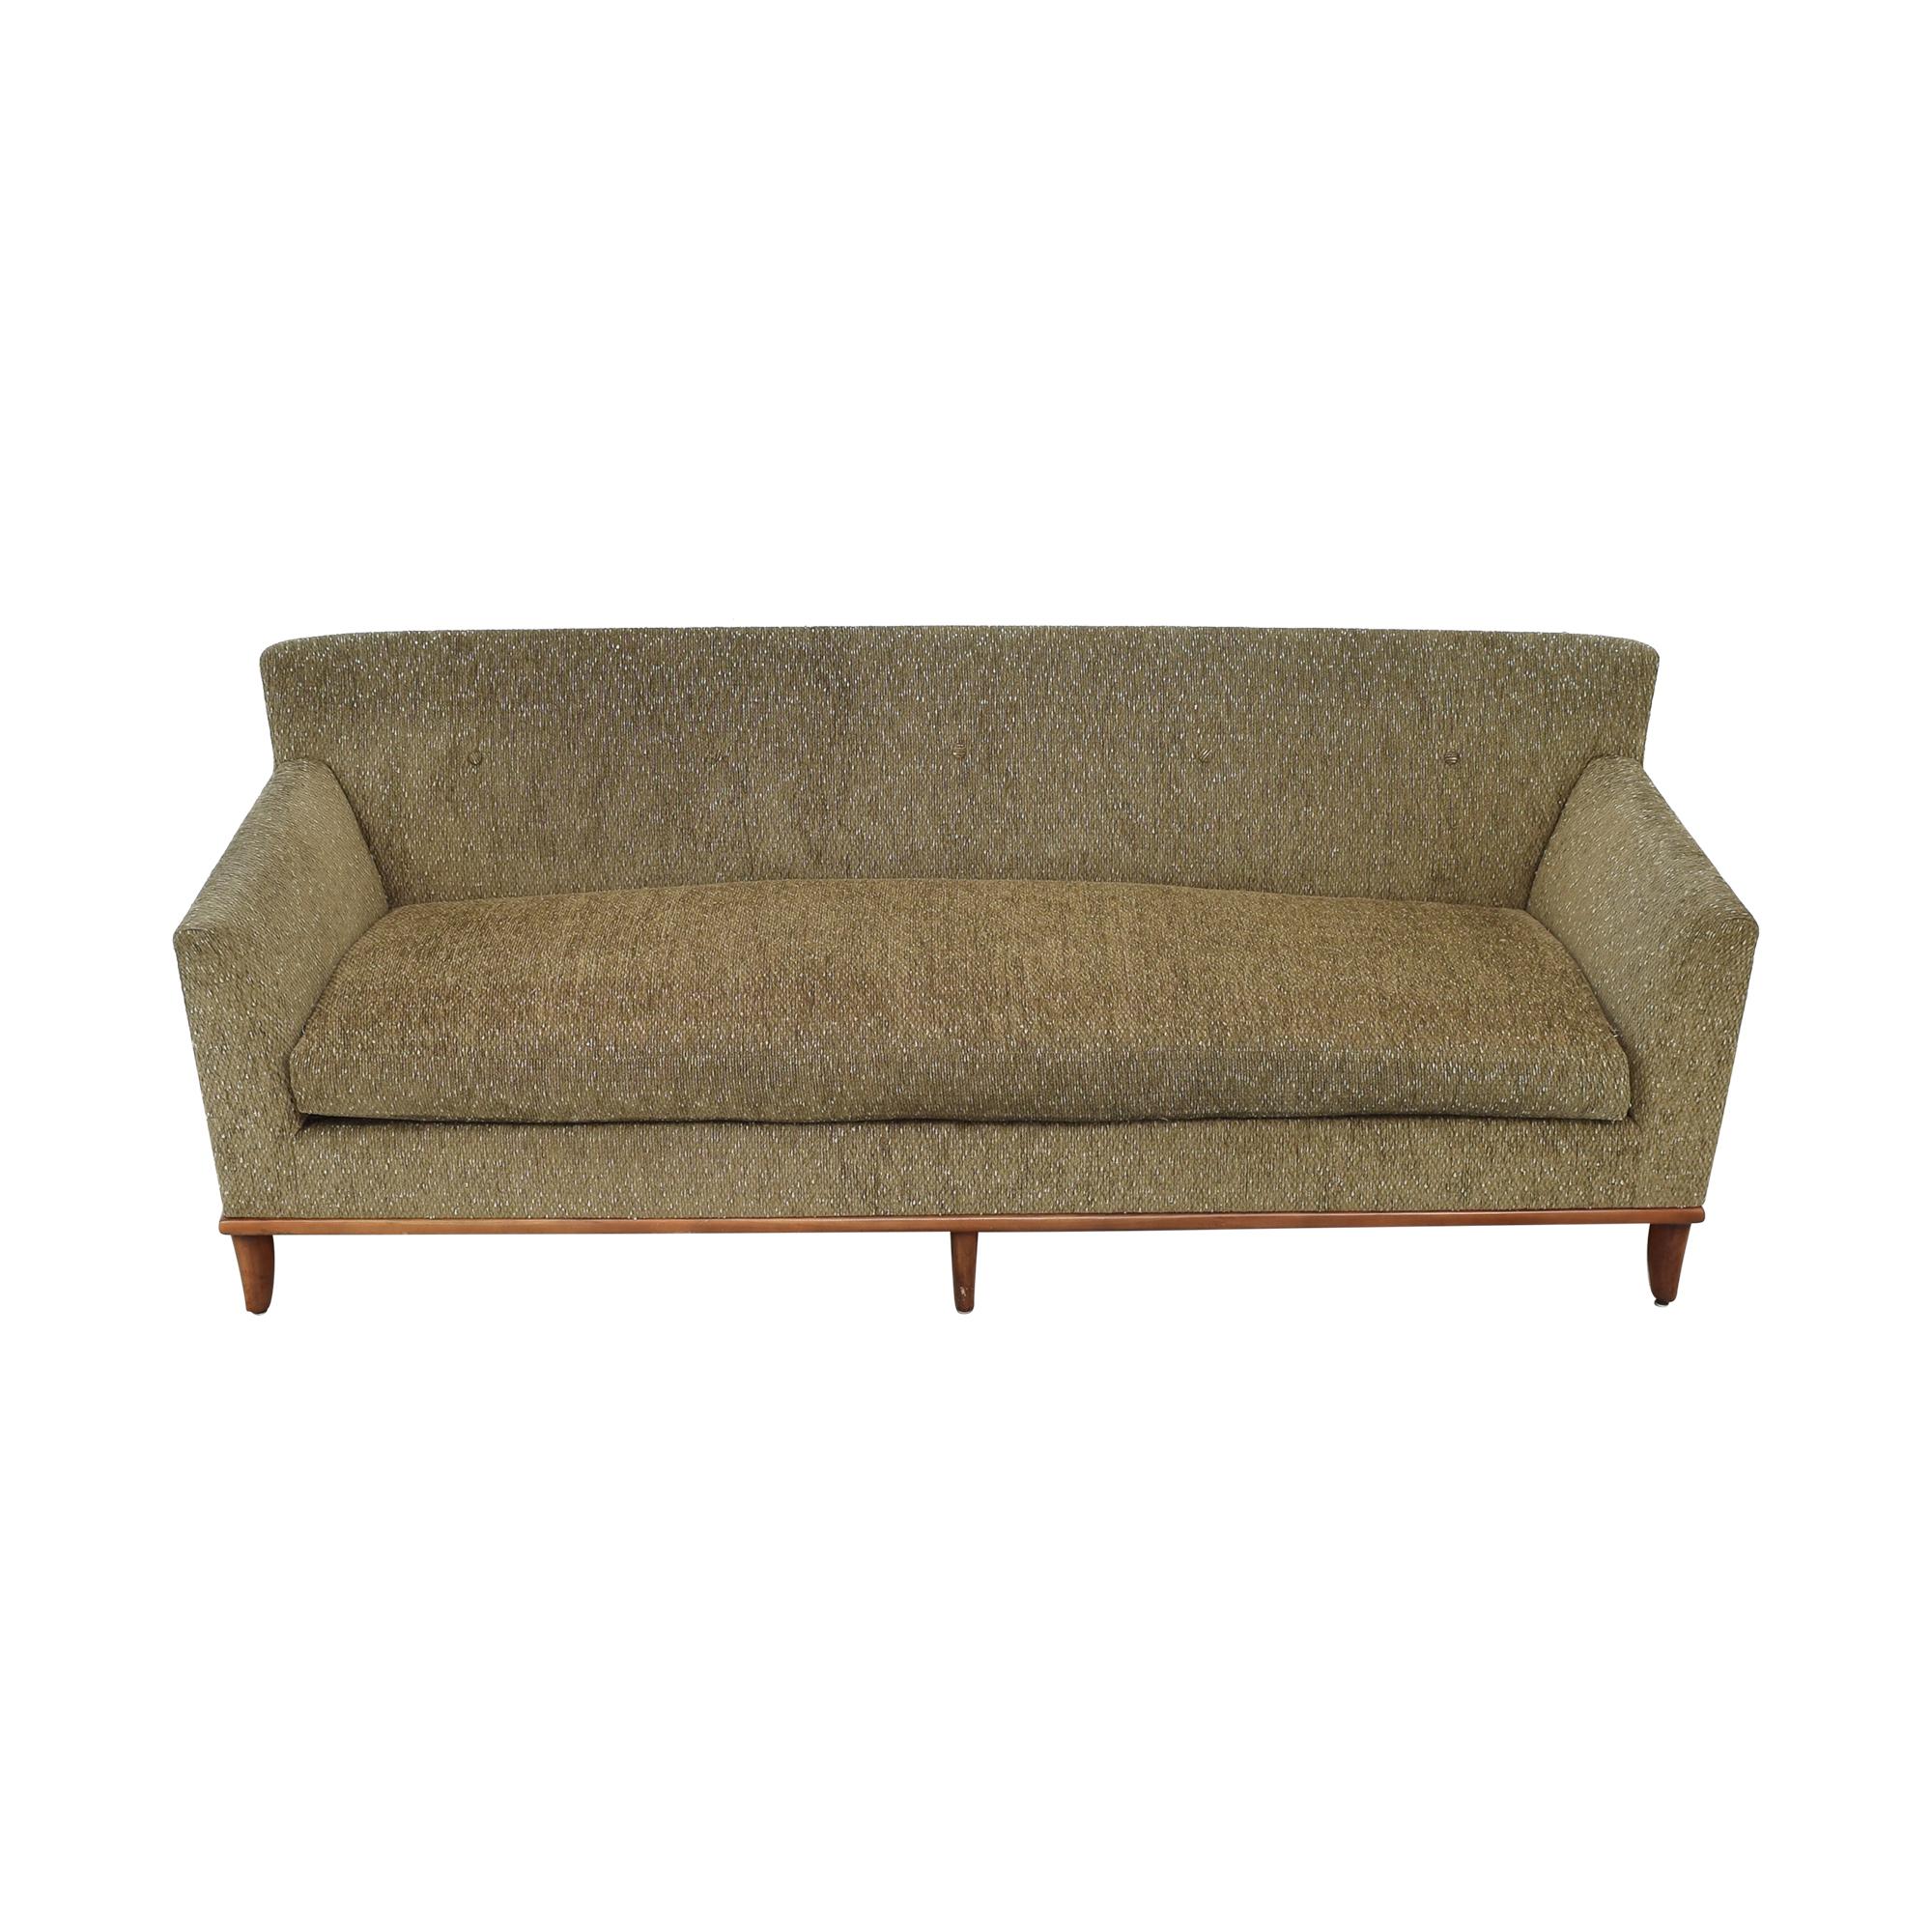 Bright Bright Single Cushion Sofa nj